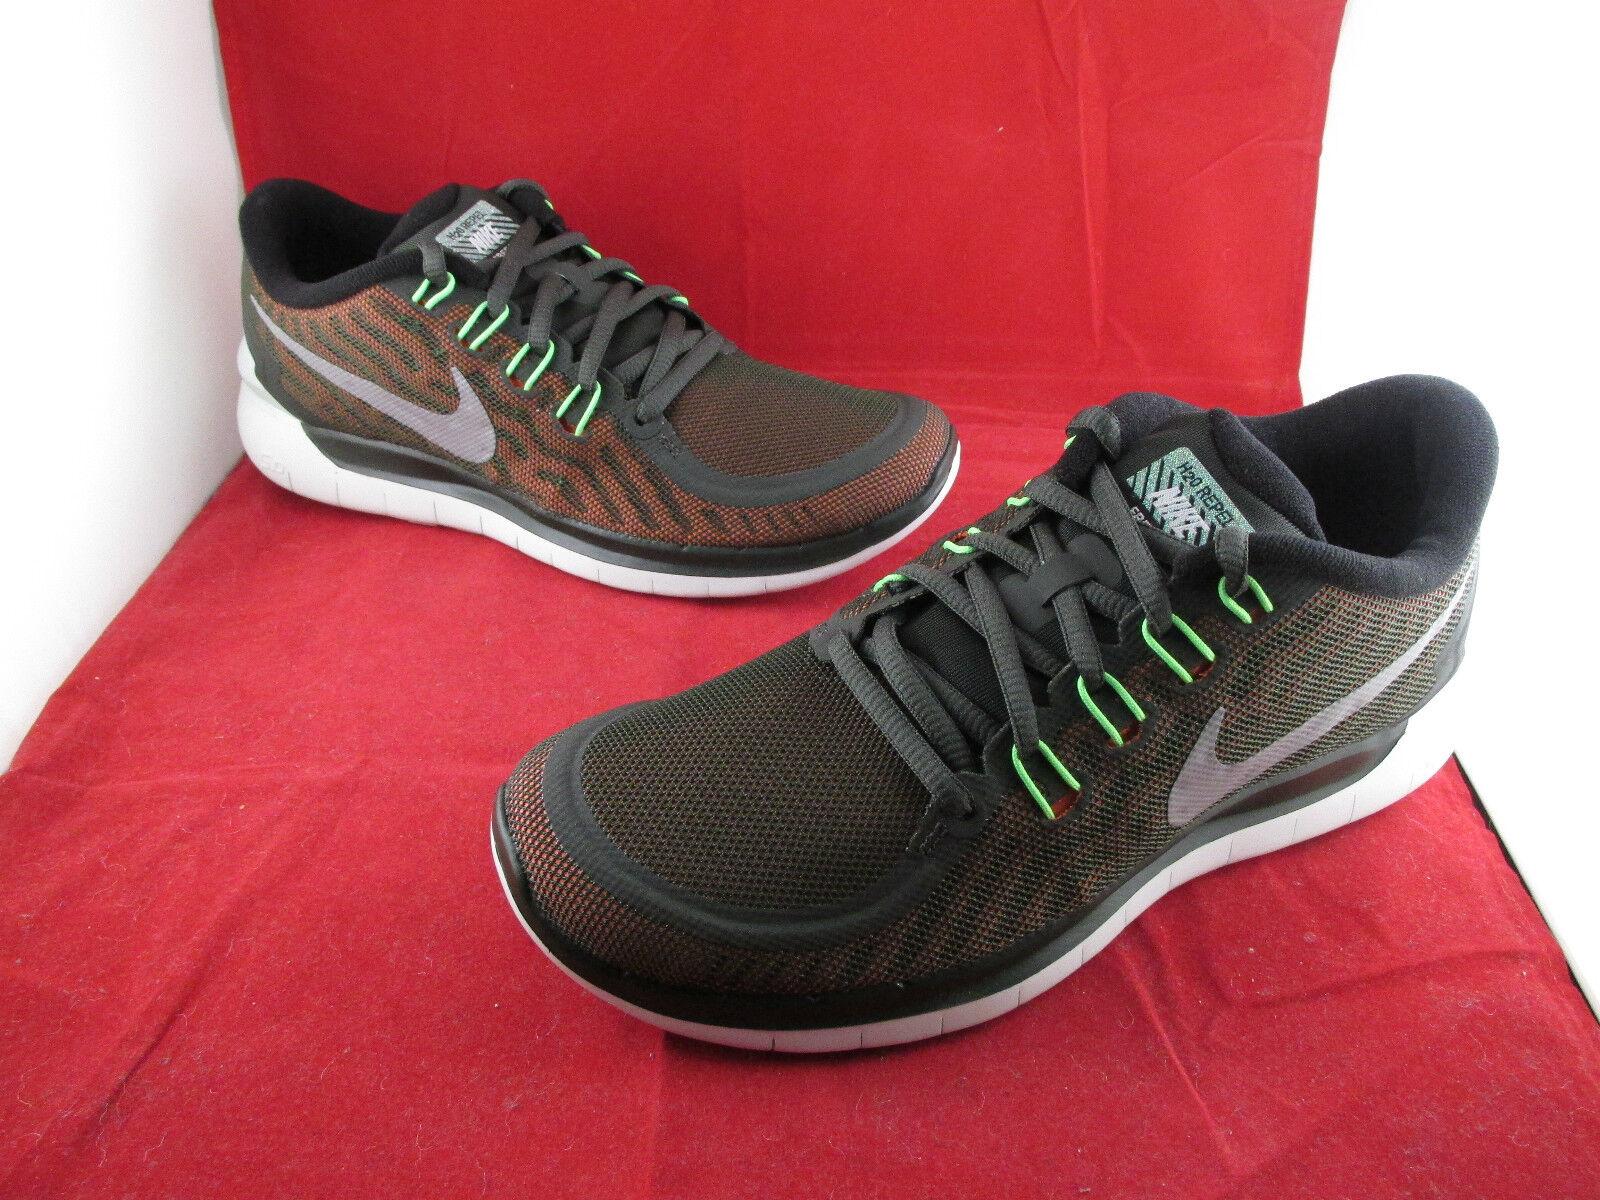 Nike Free Run 5.0 Flash 3 4 5 6 7 Running Trainer 806575-300 Sportslocker